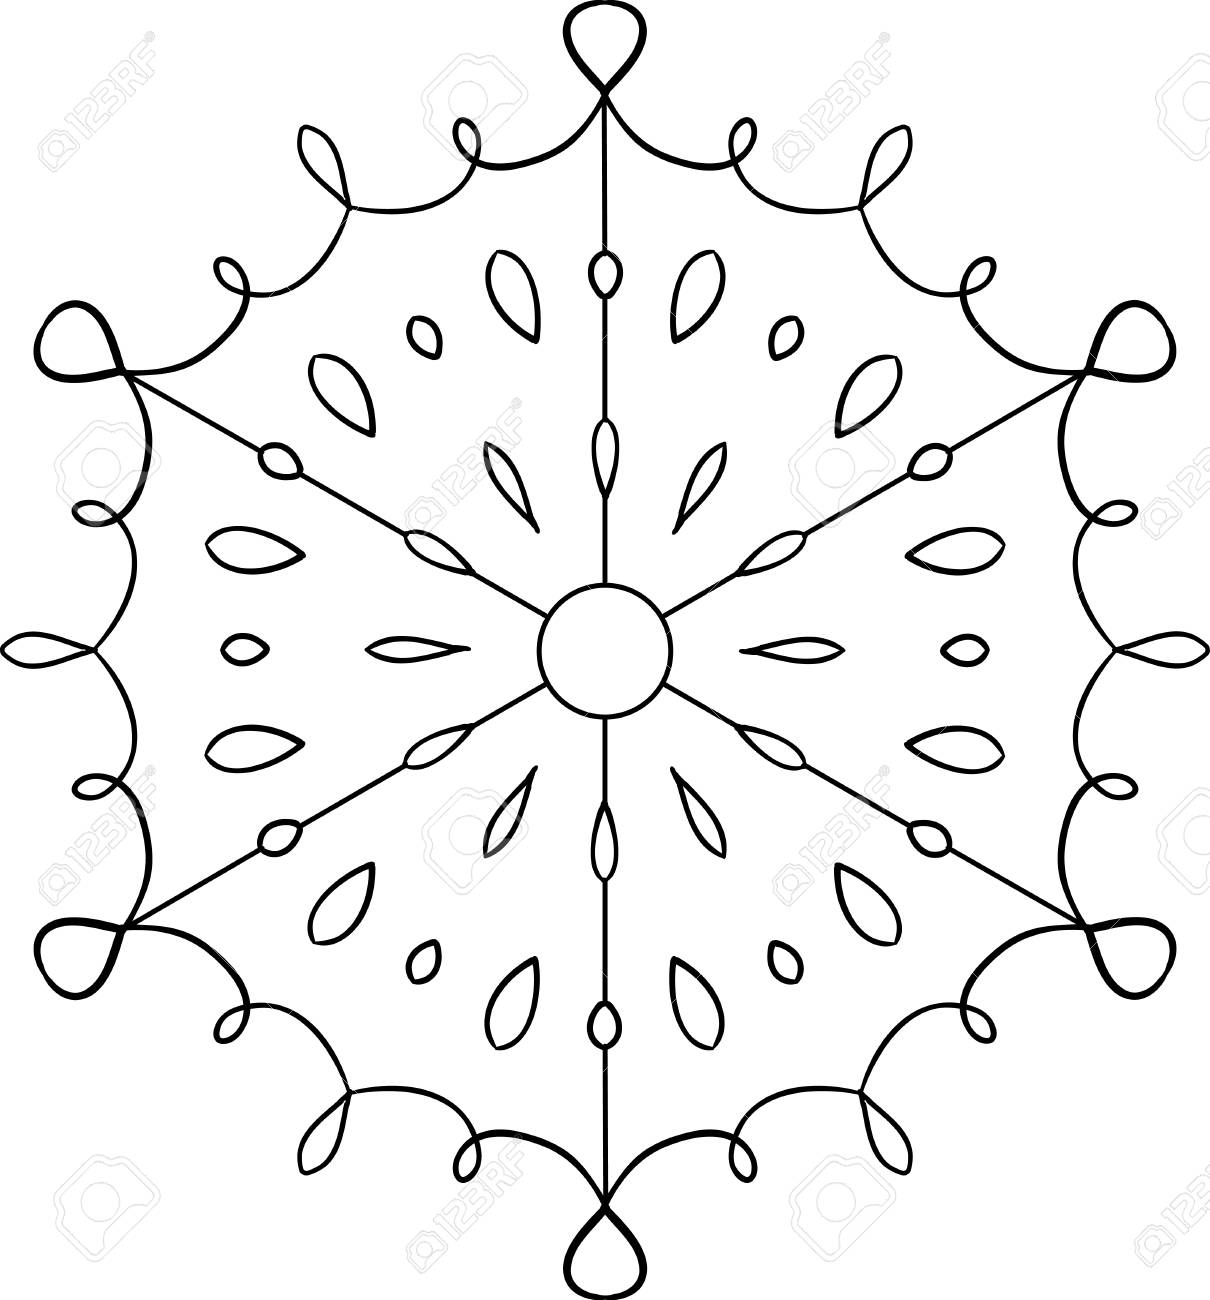 Outline Circular Snowflake Ornament. Coloring Page. Web Design ...